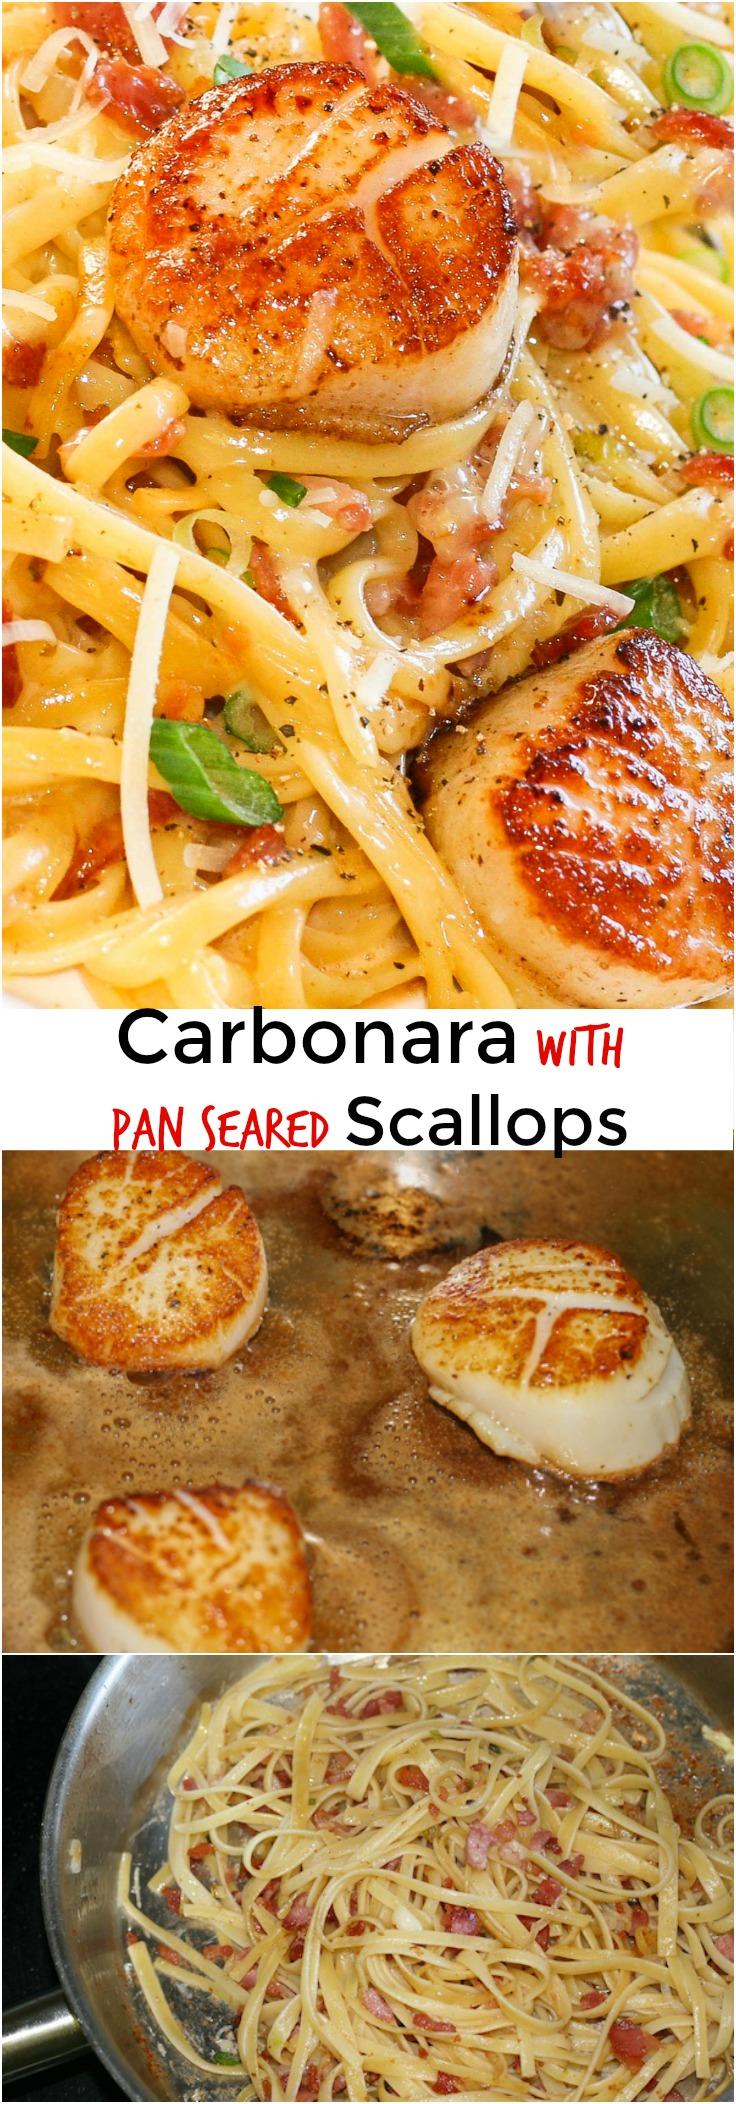 Carbonara with pan seared Scallops